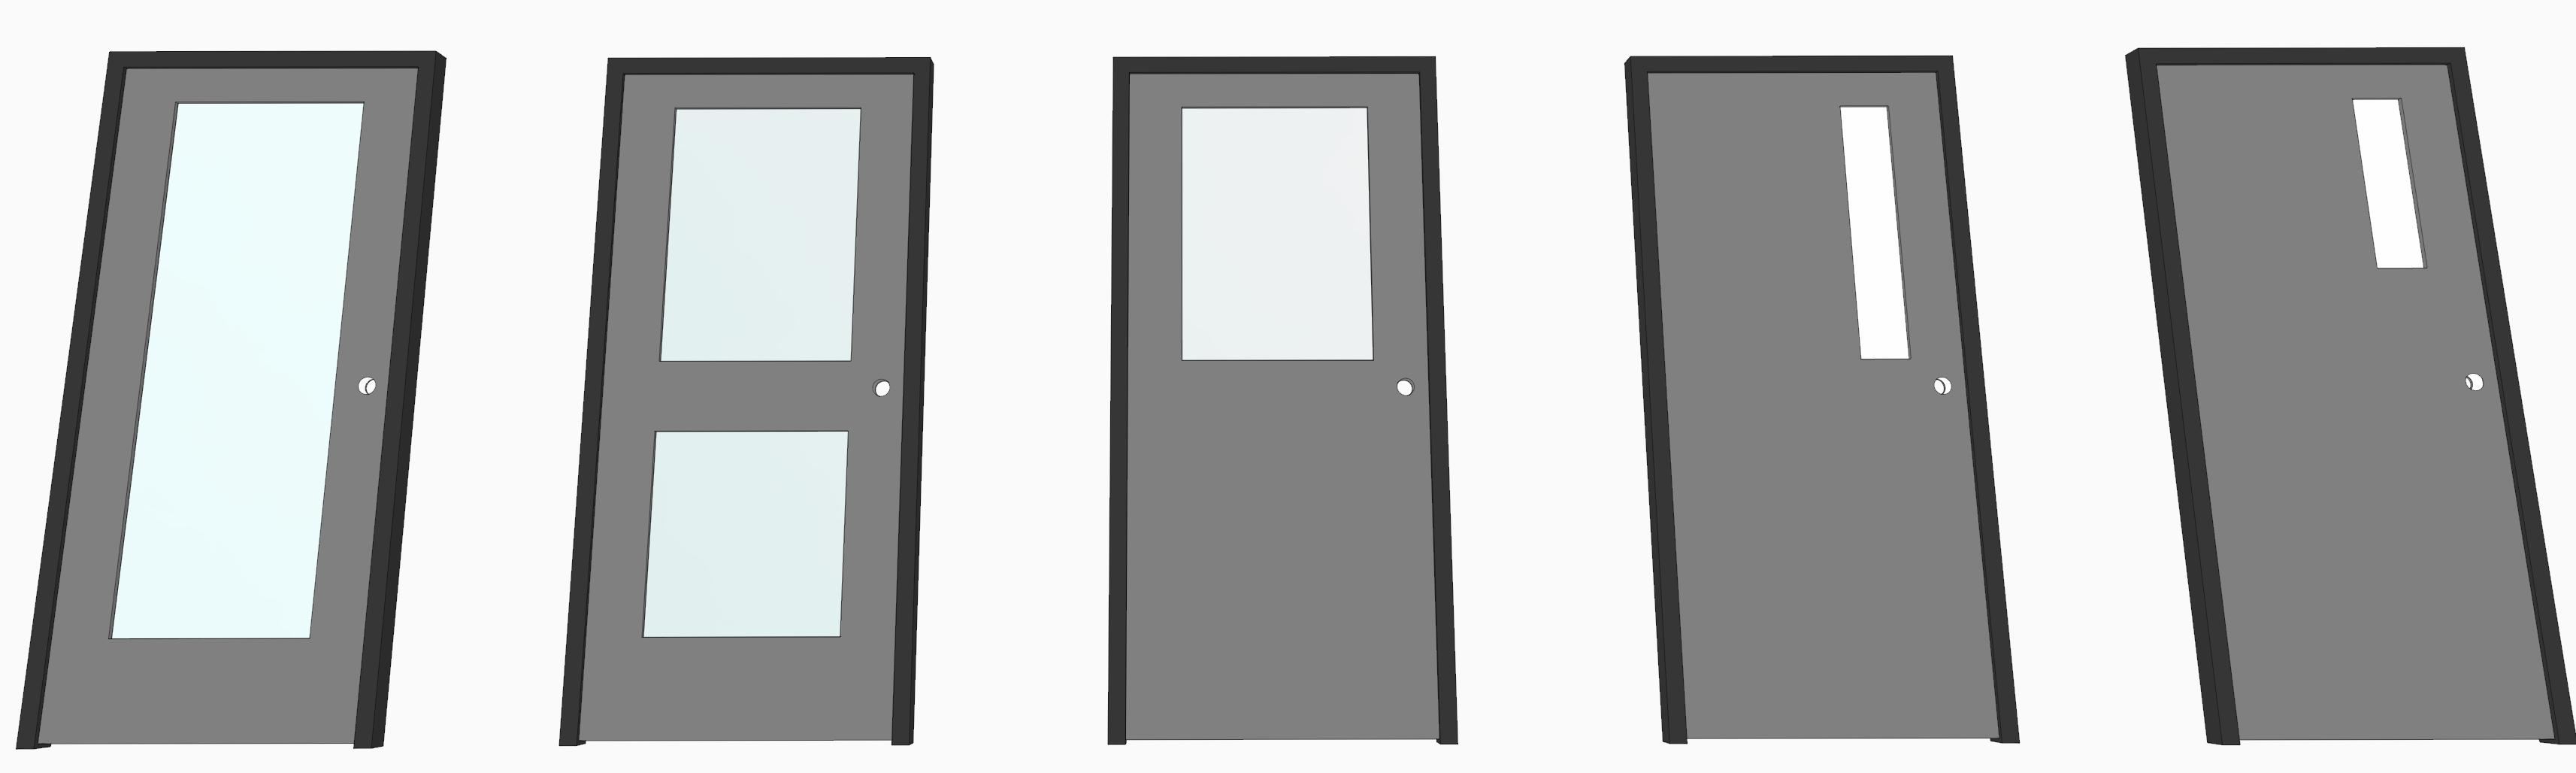 Metal door supplier in calgary and western canada commercial